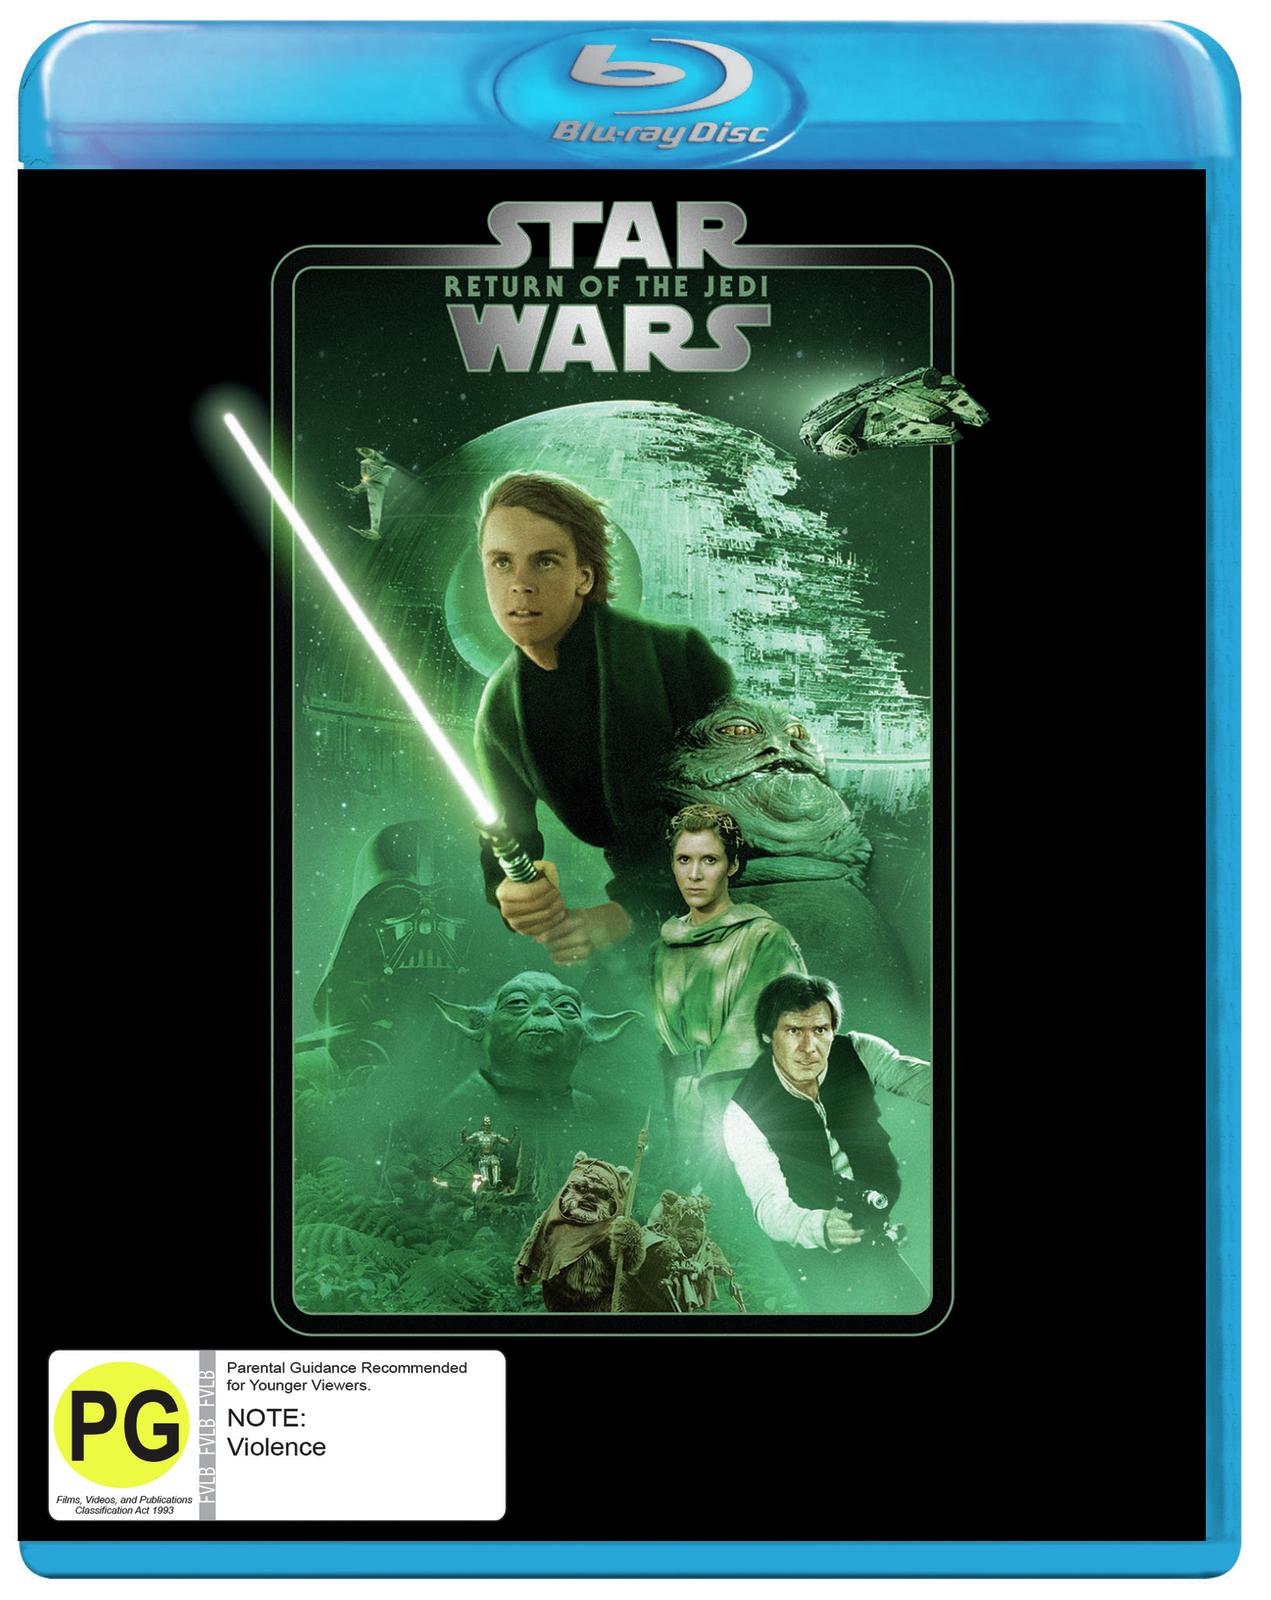 Star Wars: Episode VI - Return of the Jedi on Blu-ray image